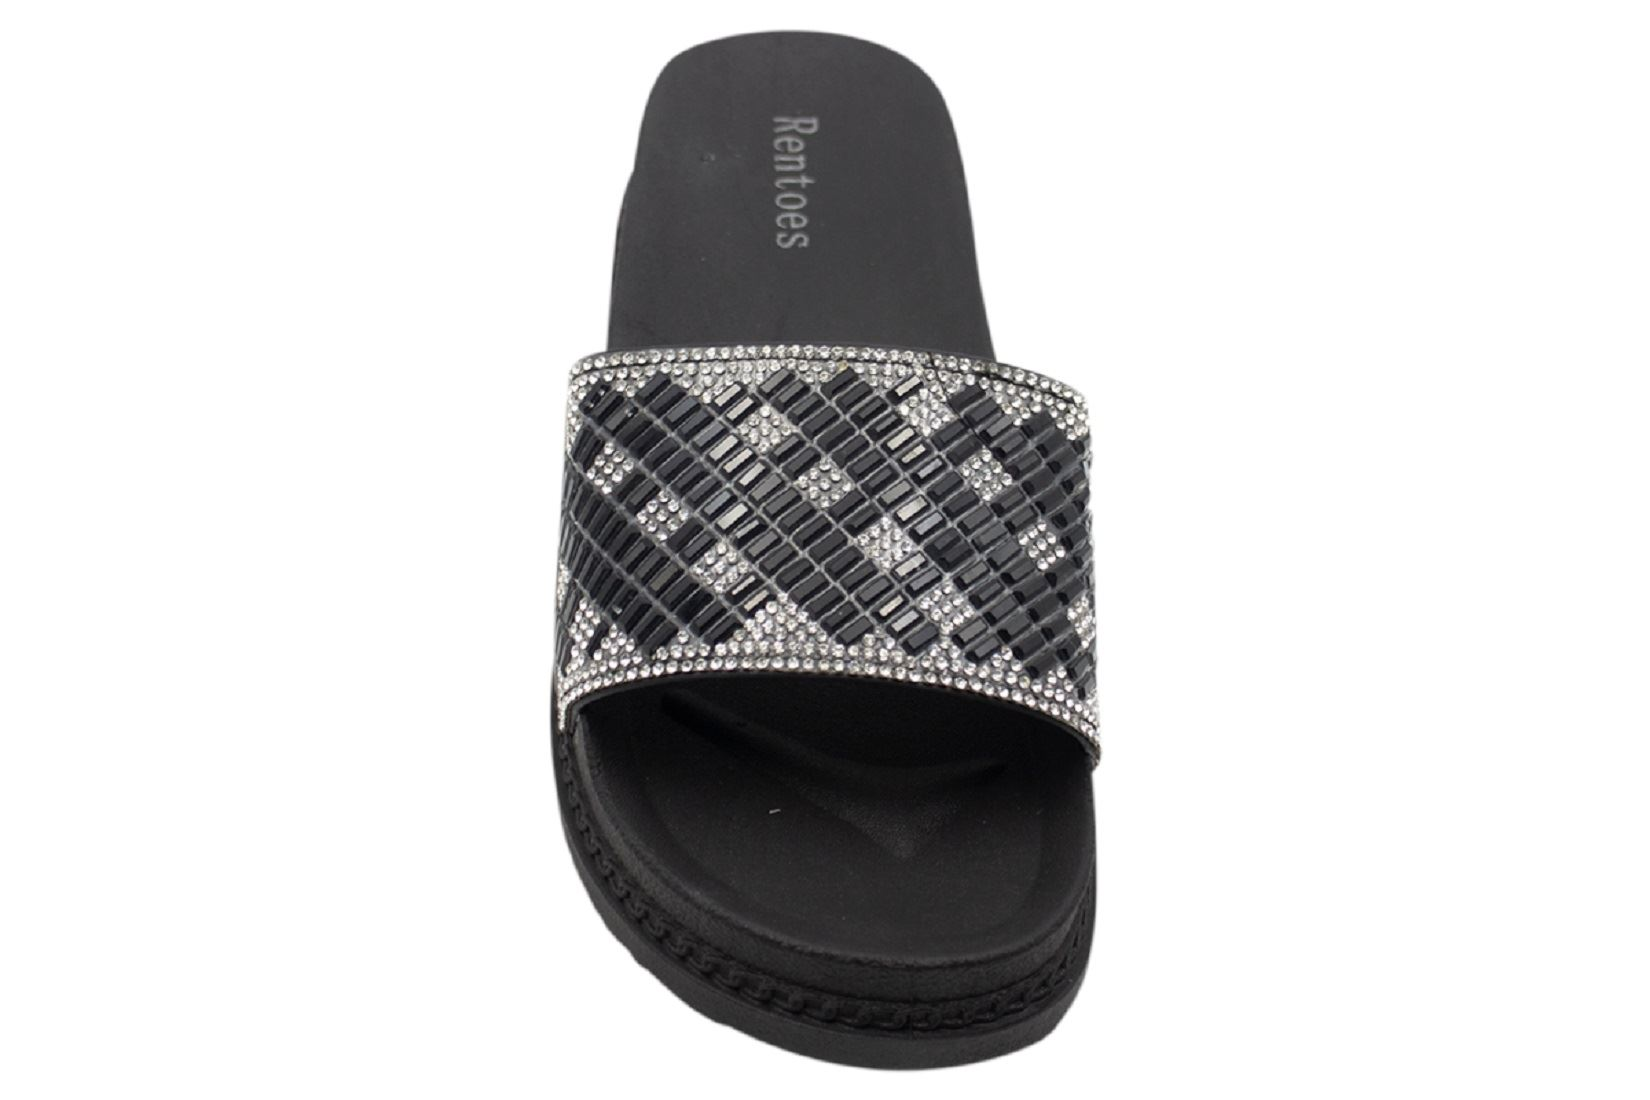 Womens-Sliders-Casual-Slippers-Mules-Ladies-Diamante-Flip-Flop-Sandals-Shoes thumbnail 73